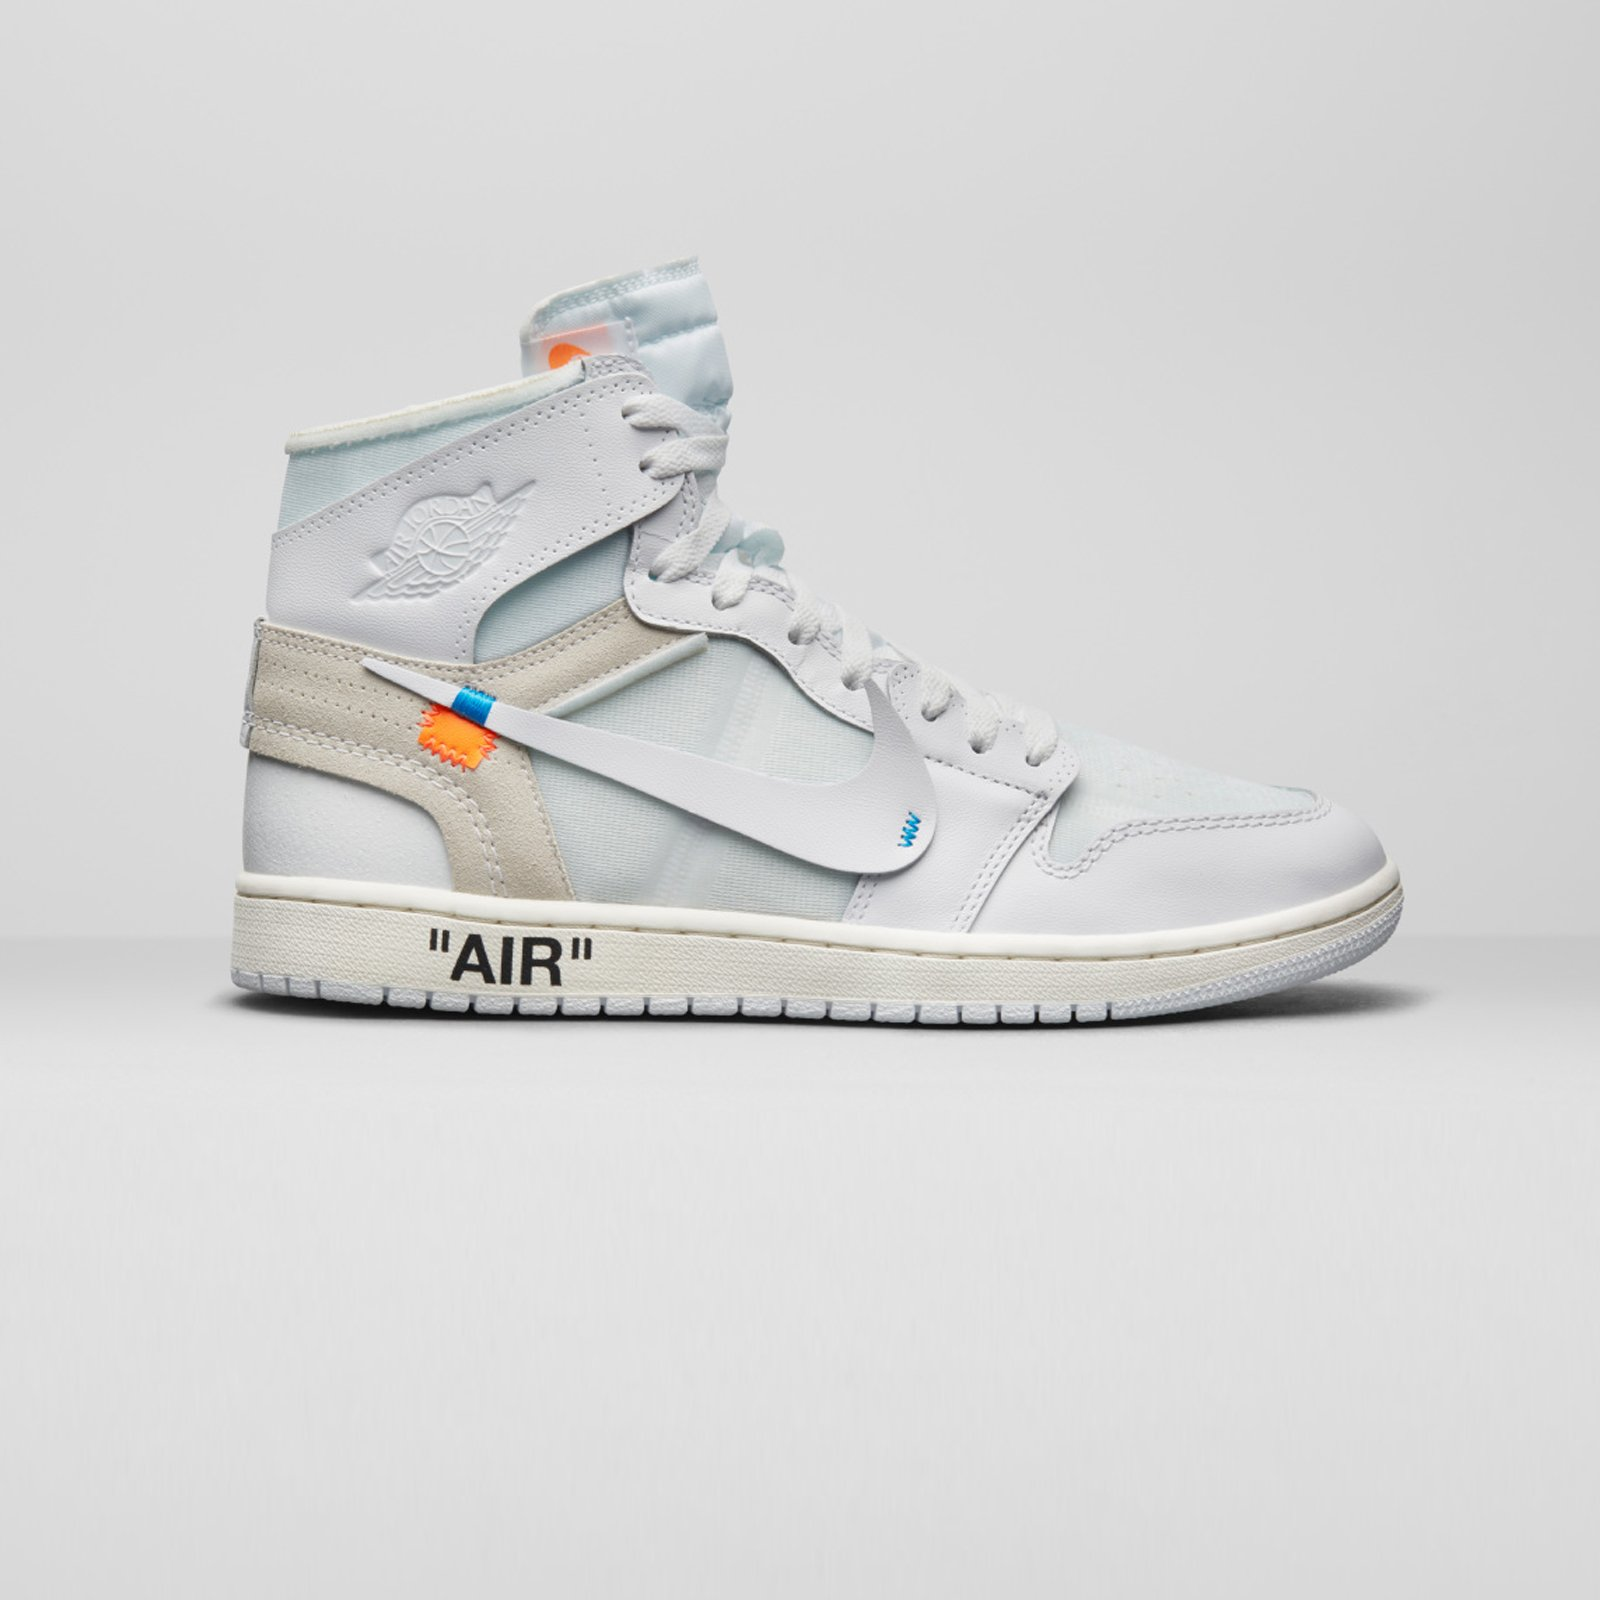 Jordan Brand Air Jordan 1 x OFF-WHITE